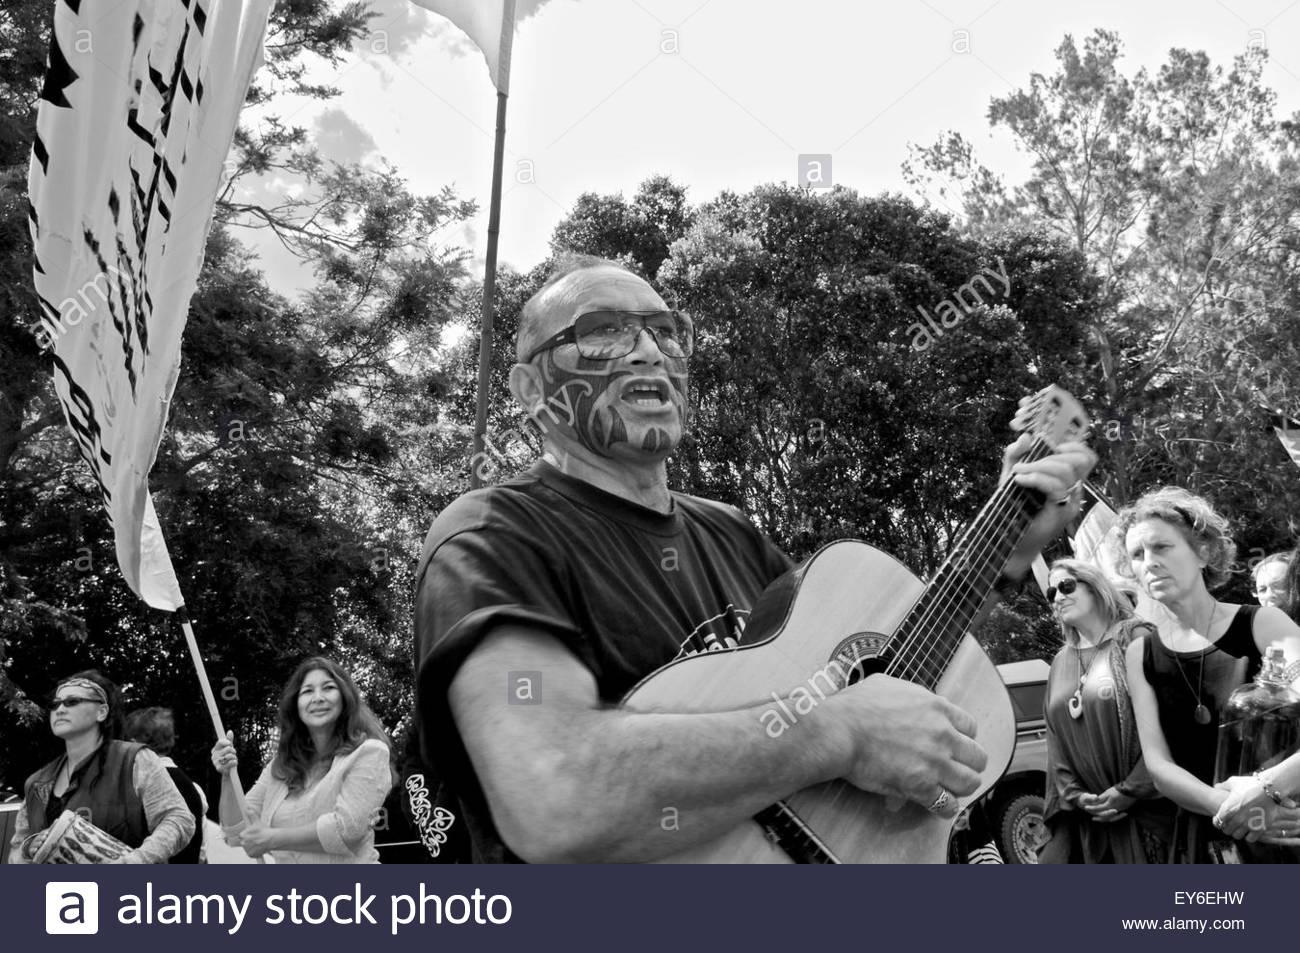 Maori activists' protest during Waitangi Day annual commemorations on Waitangi Treaty Grounds, Bay of Islands, - Stock Image